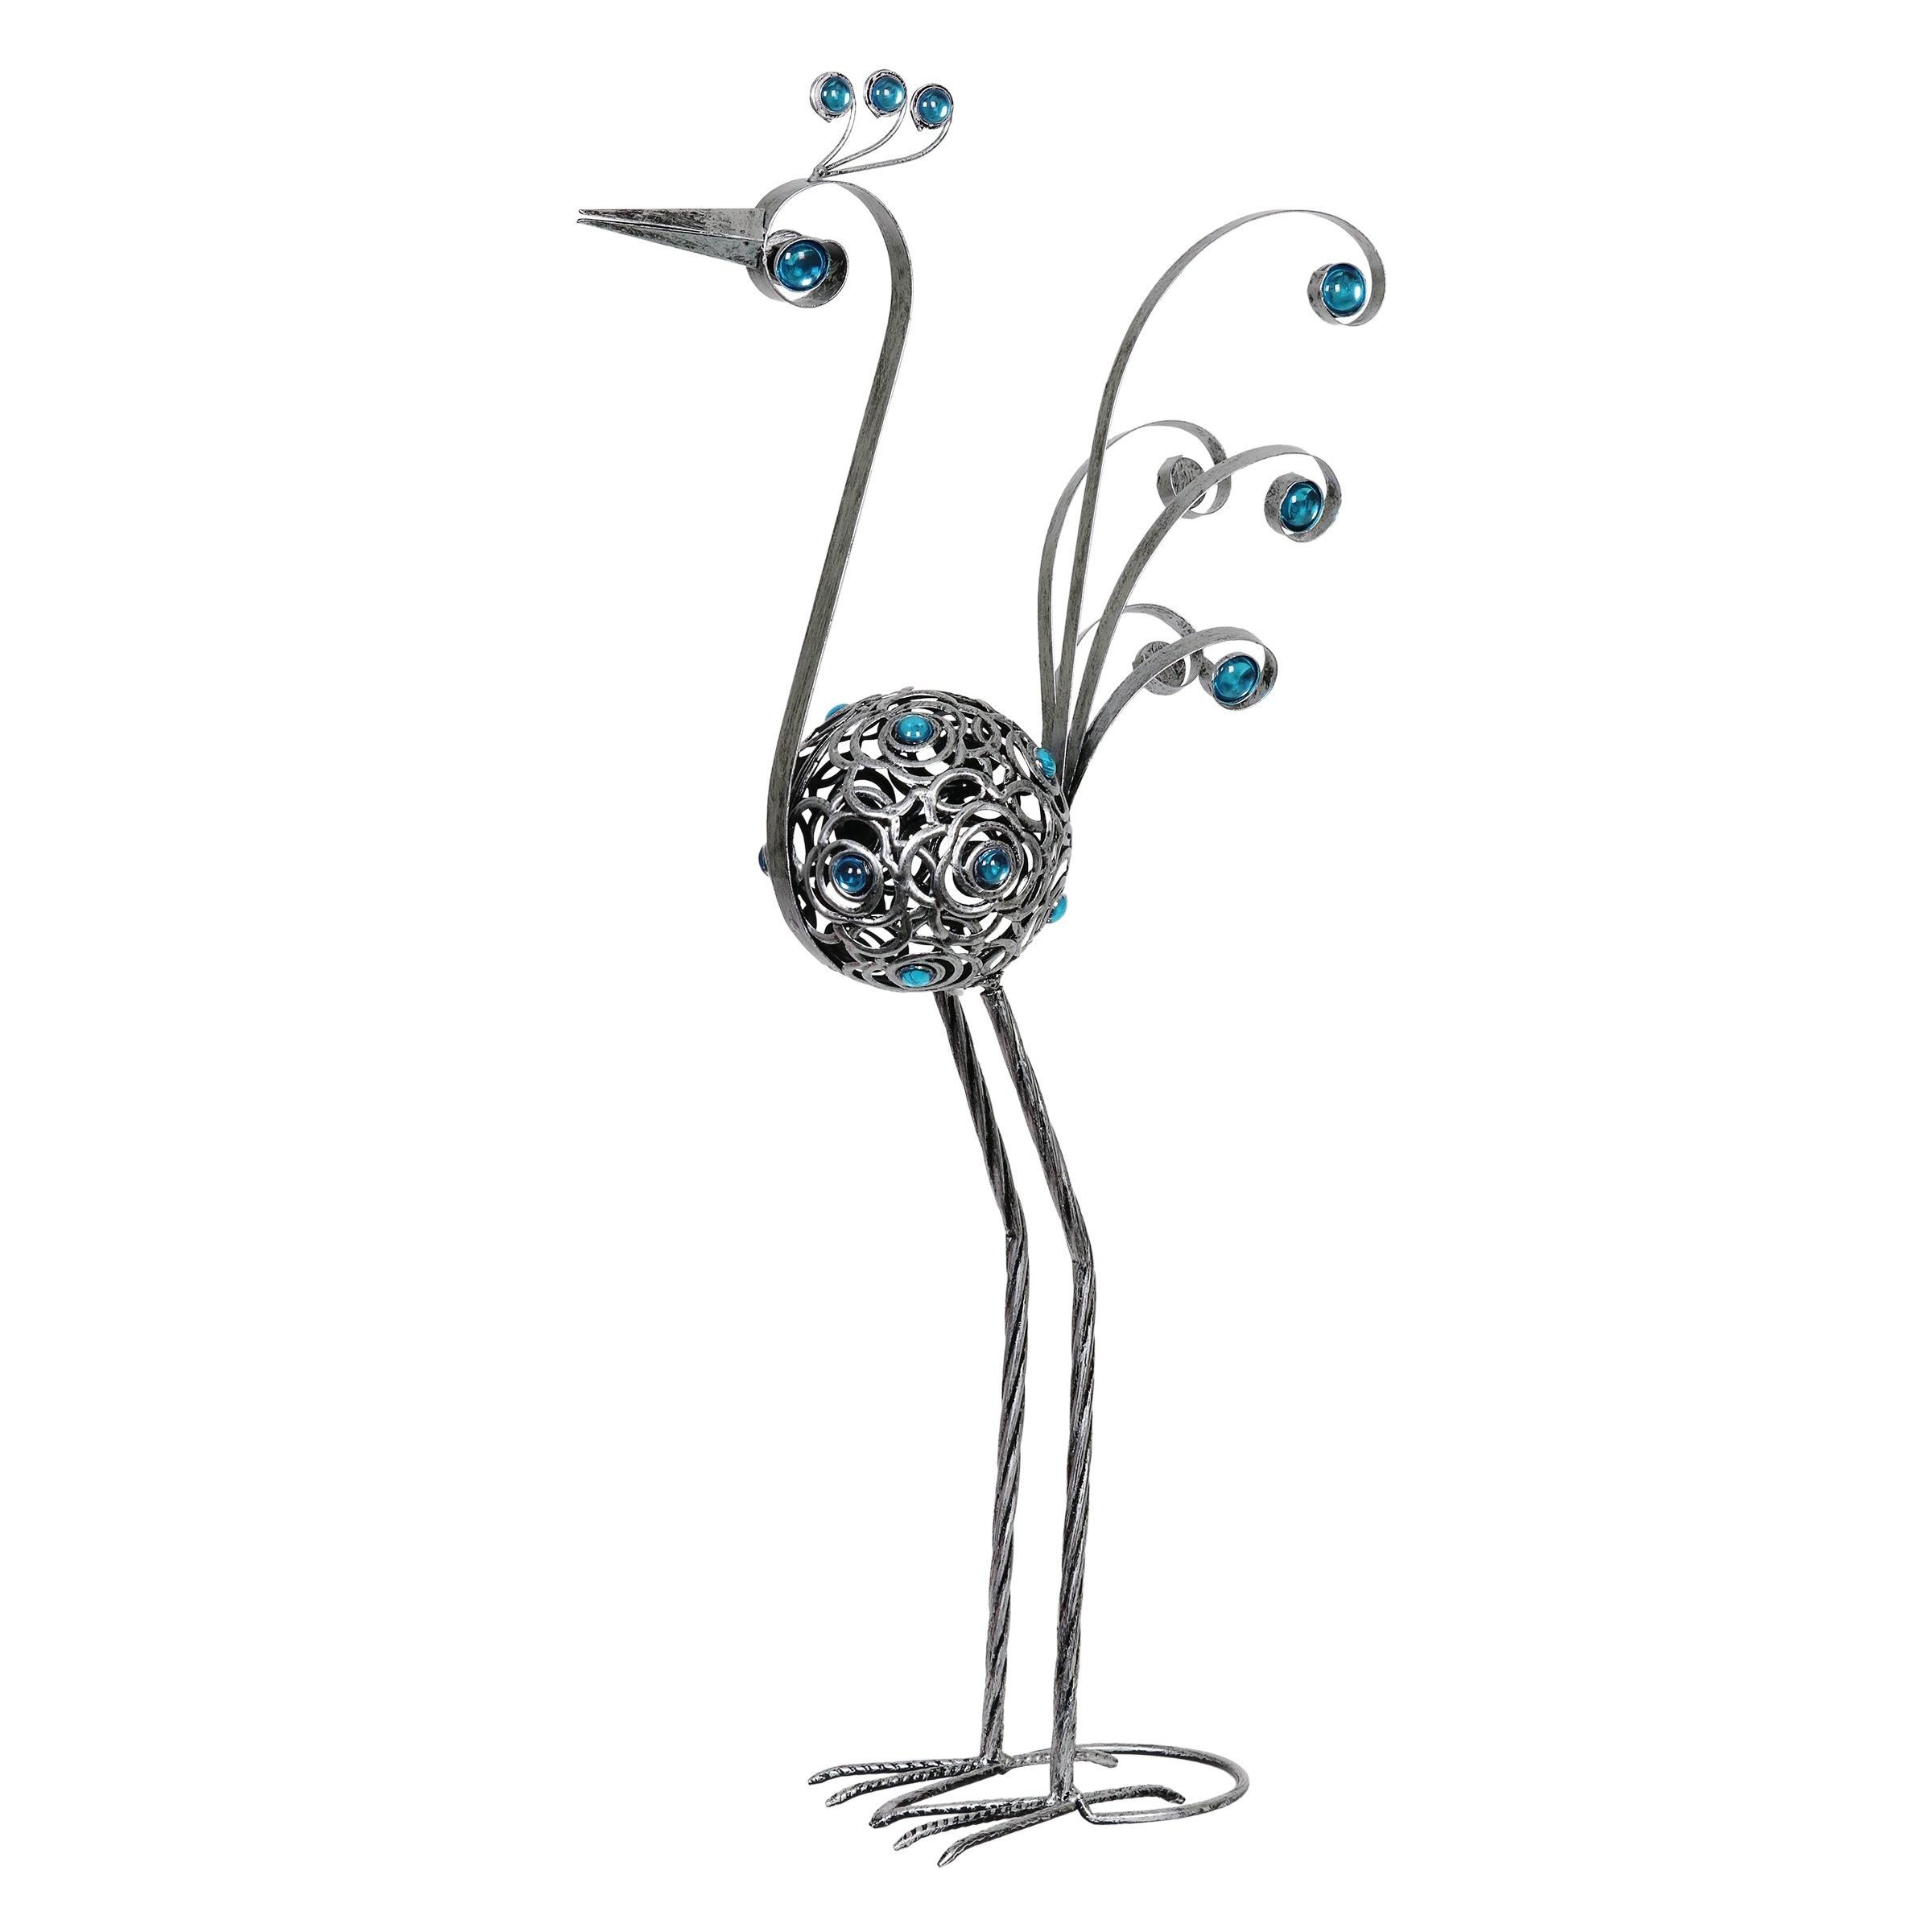 28 Inch Pewter Filigree Bird Statue, Statuary, Metal, Elegant Bird, Home/Indoor / Outdoor Decoration